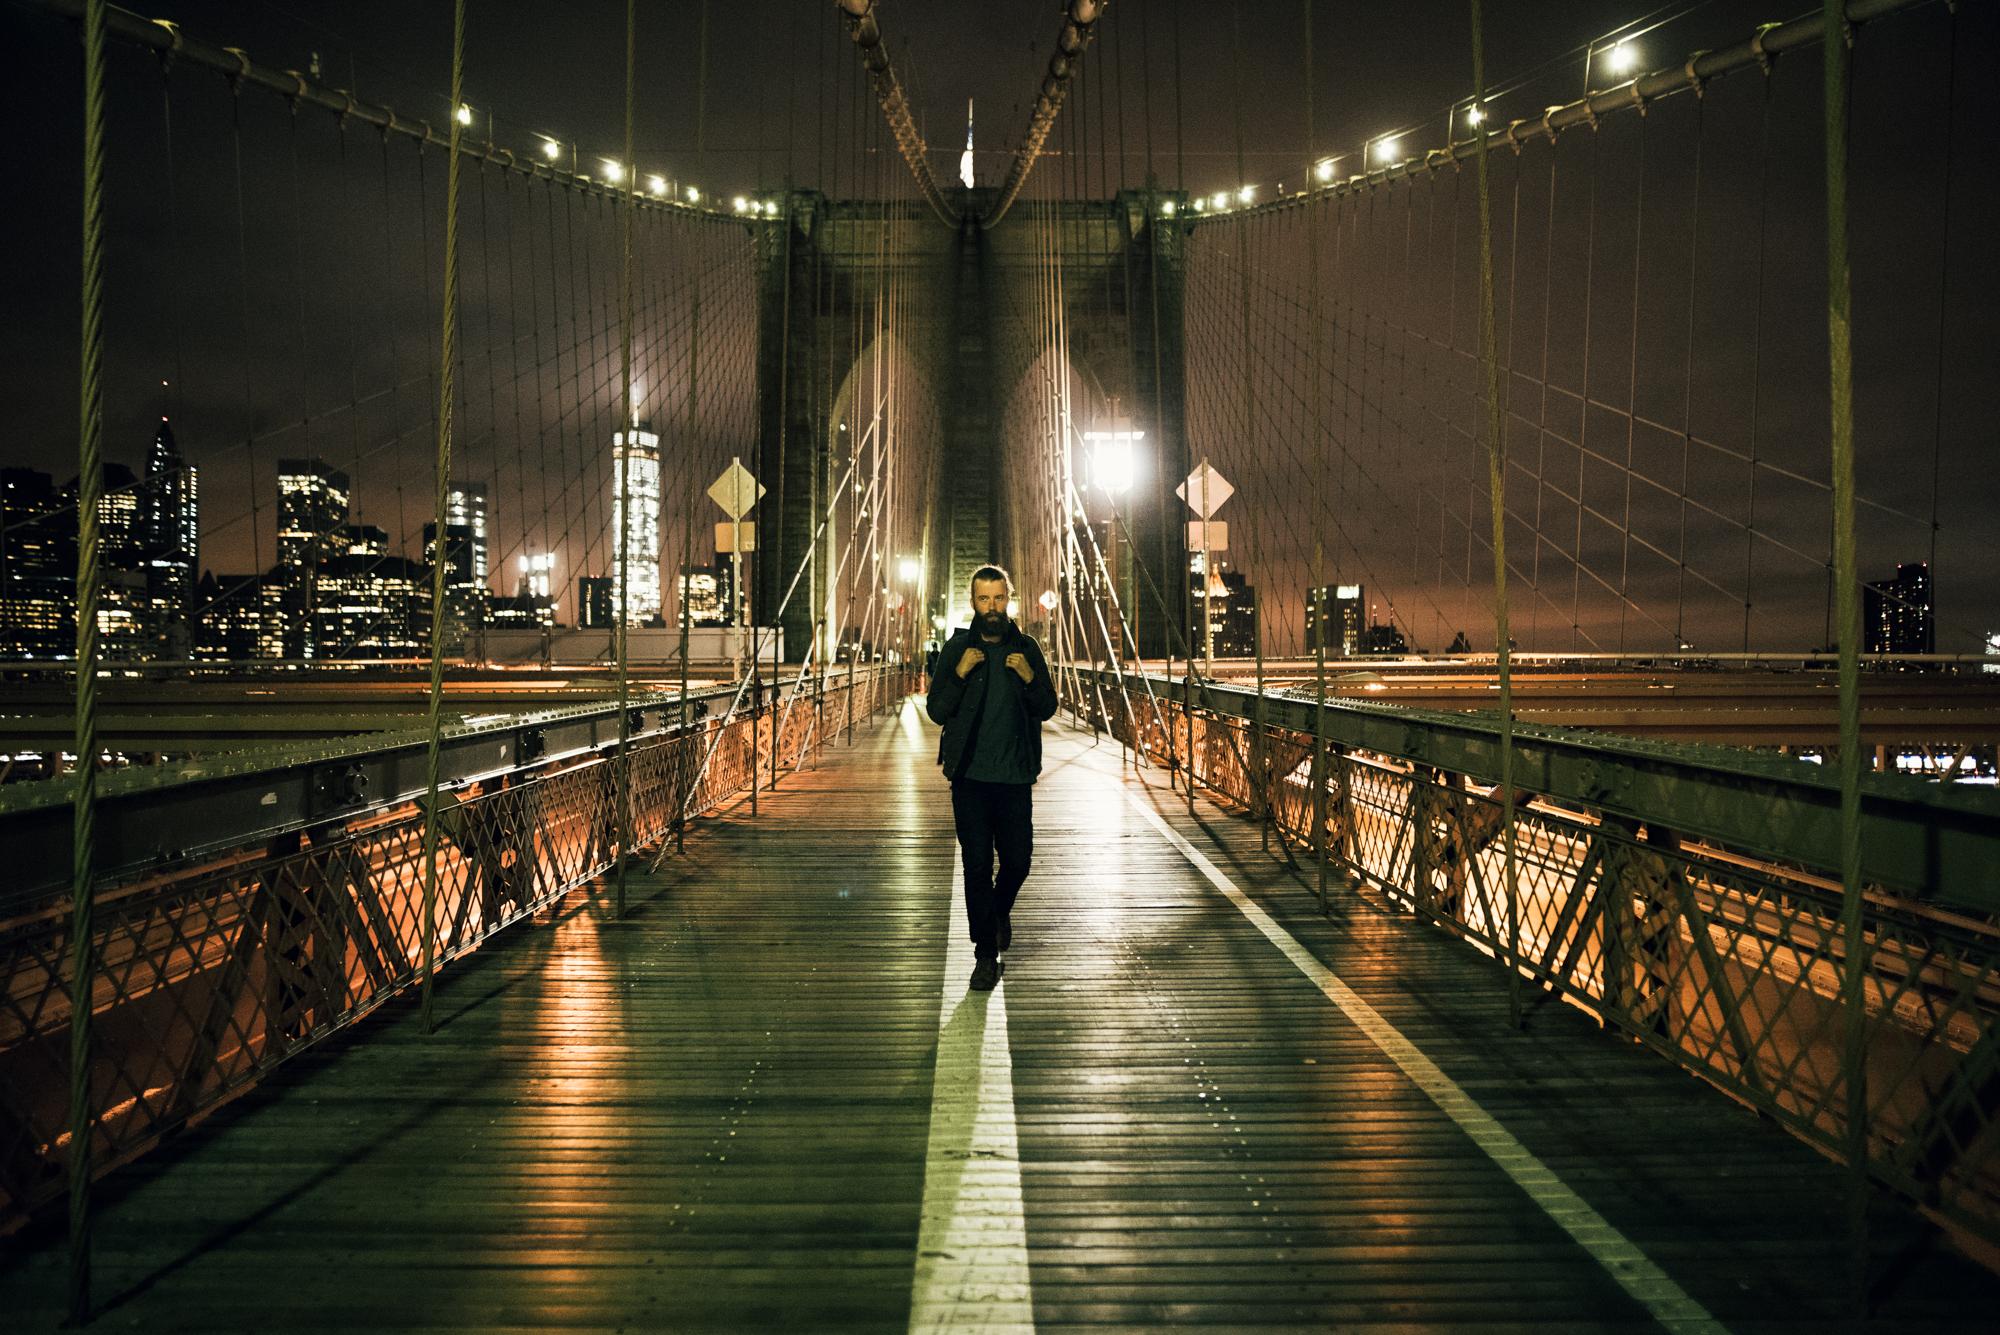 ©The Ryans Photography - NYC Night-032.jpg